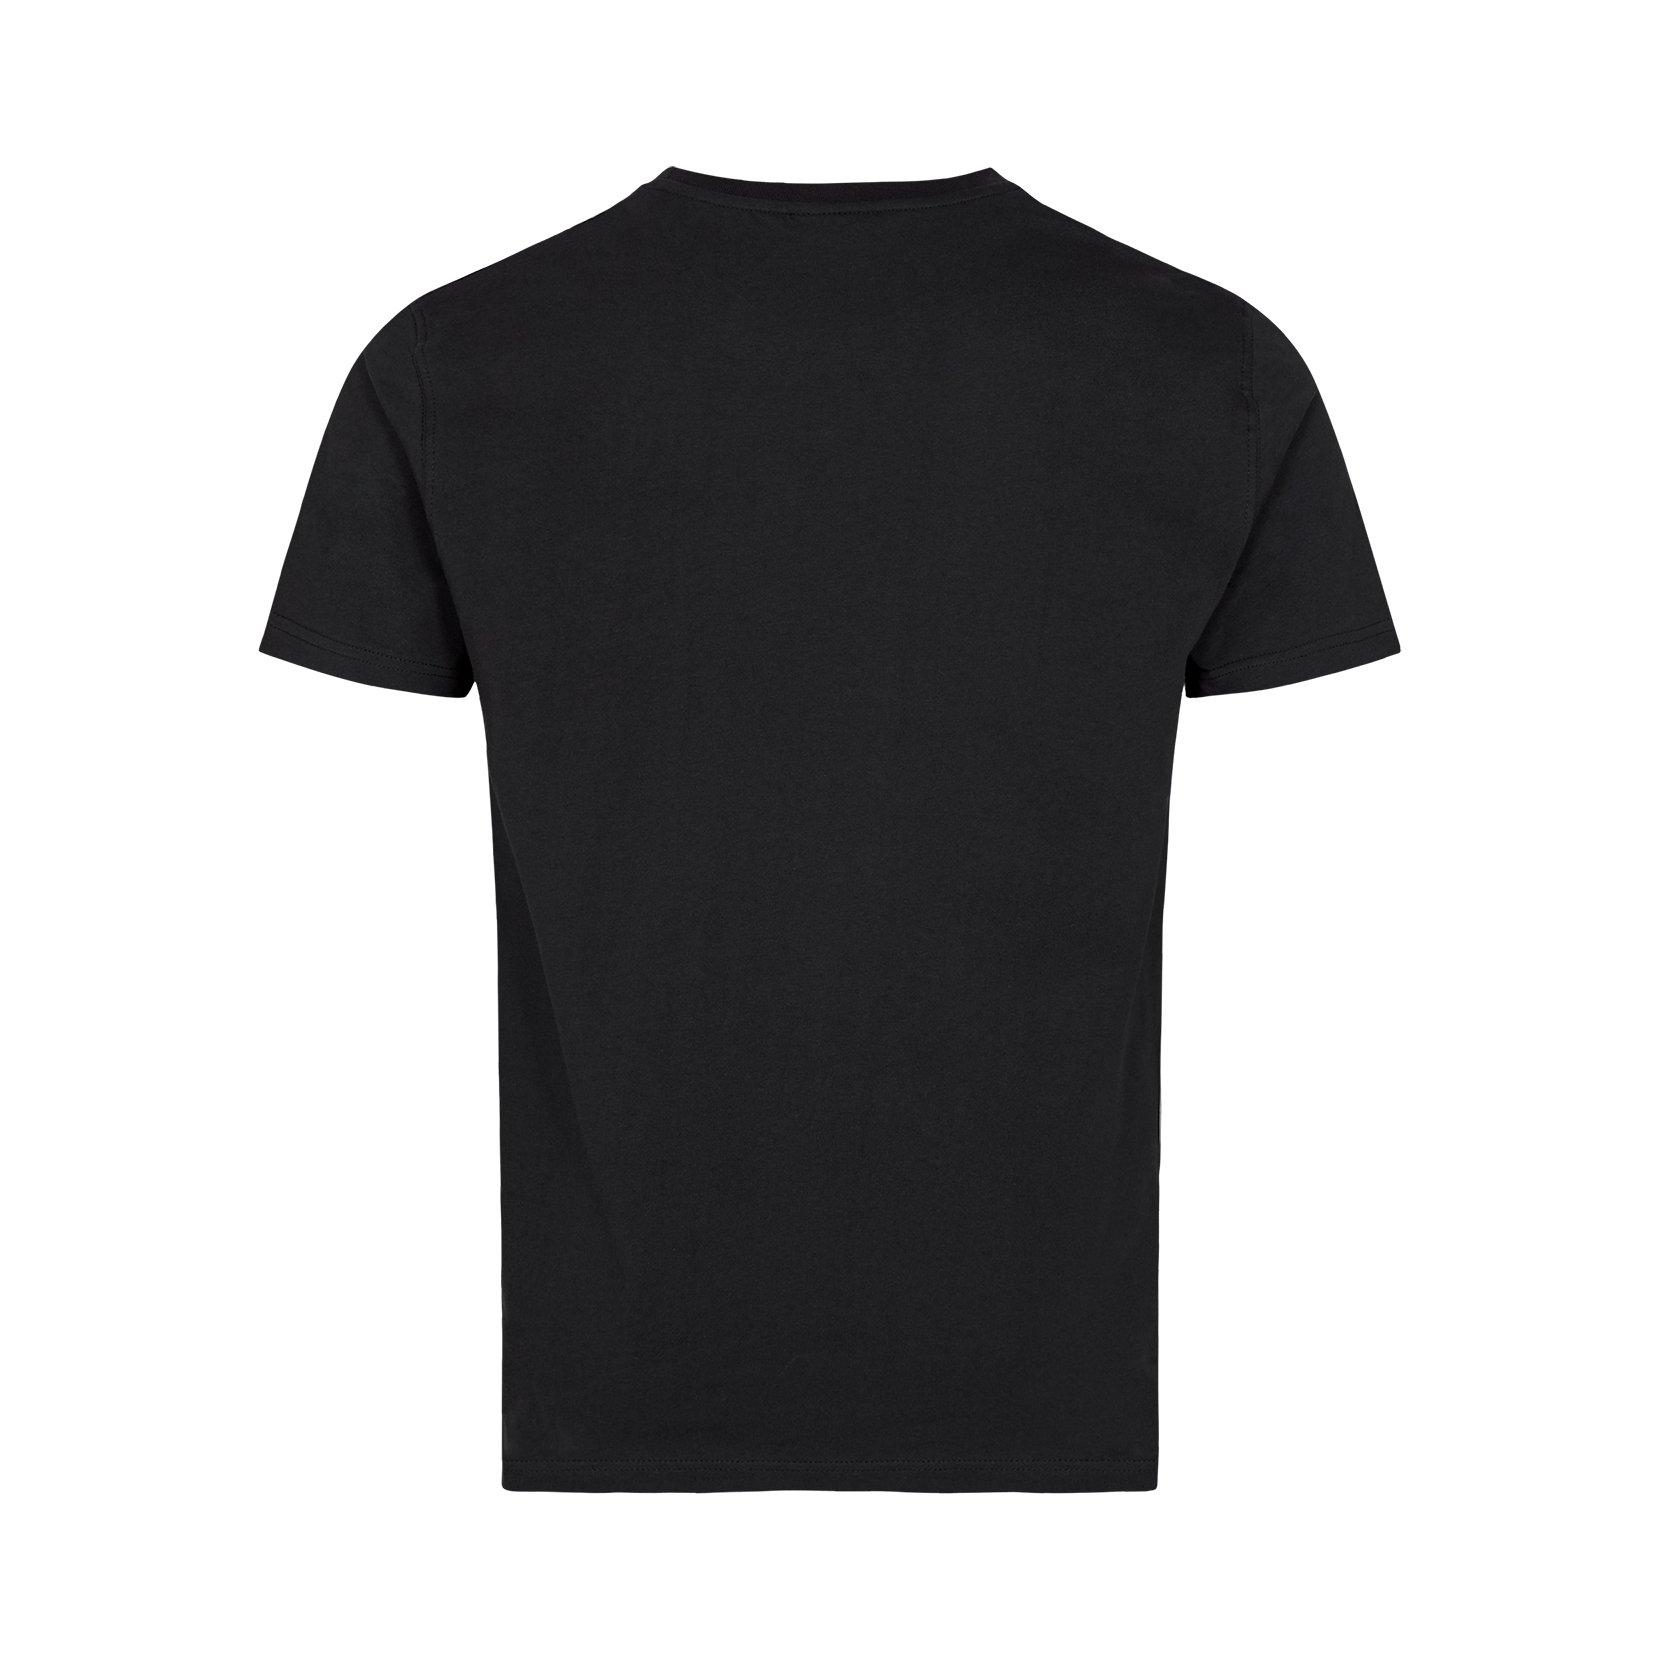 H2O Als t-shirt, black, x-large